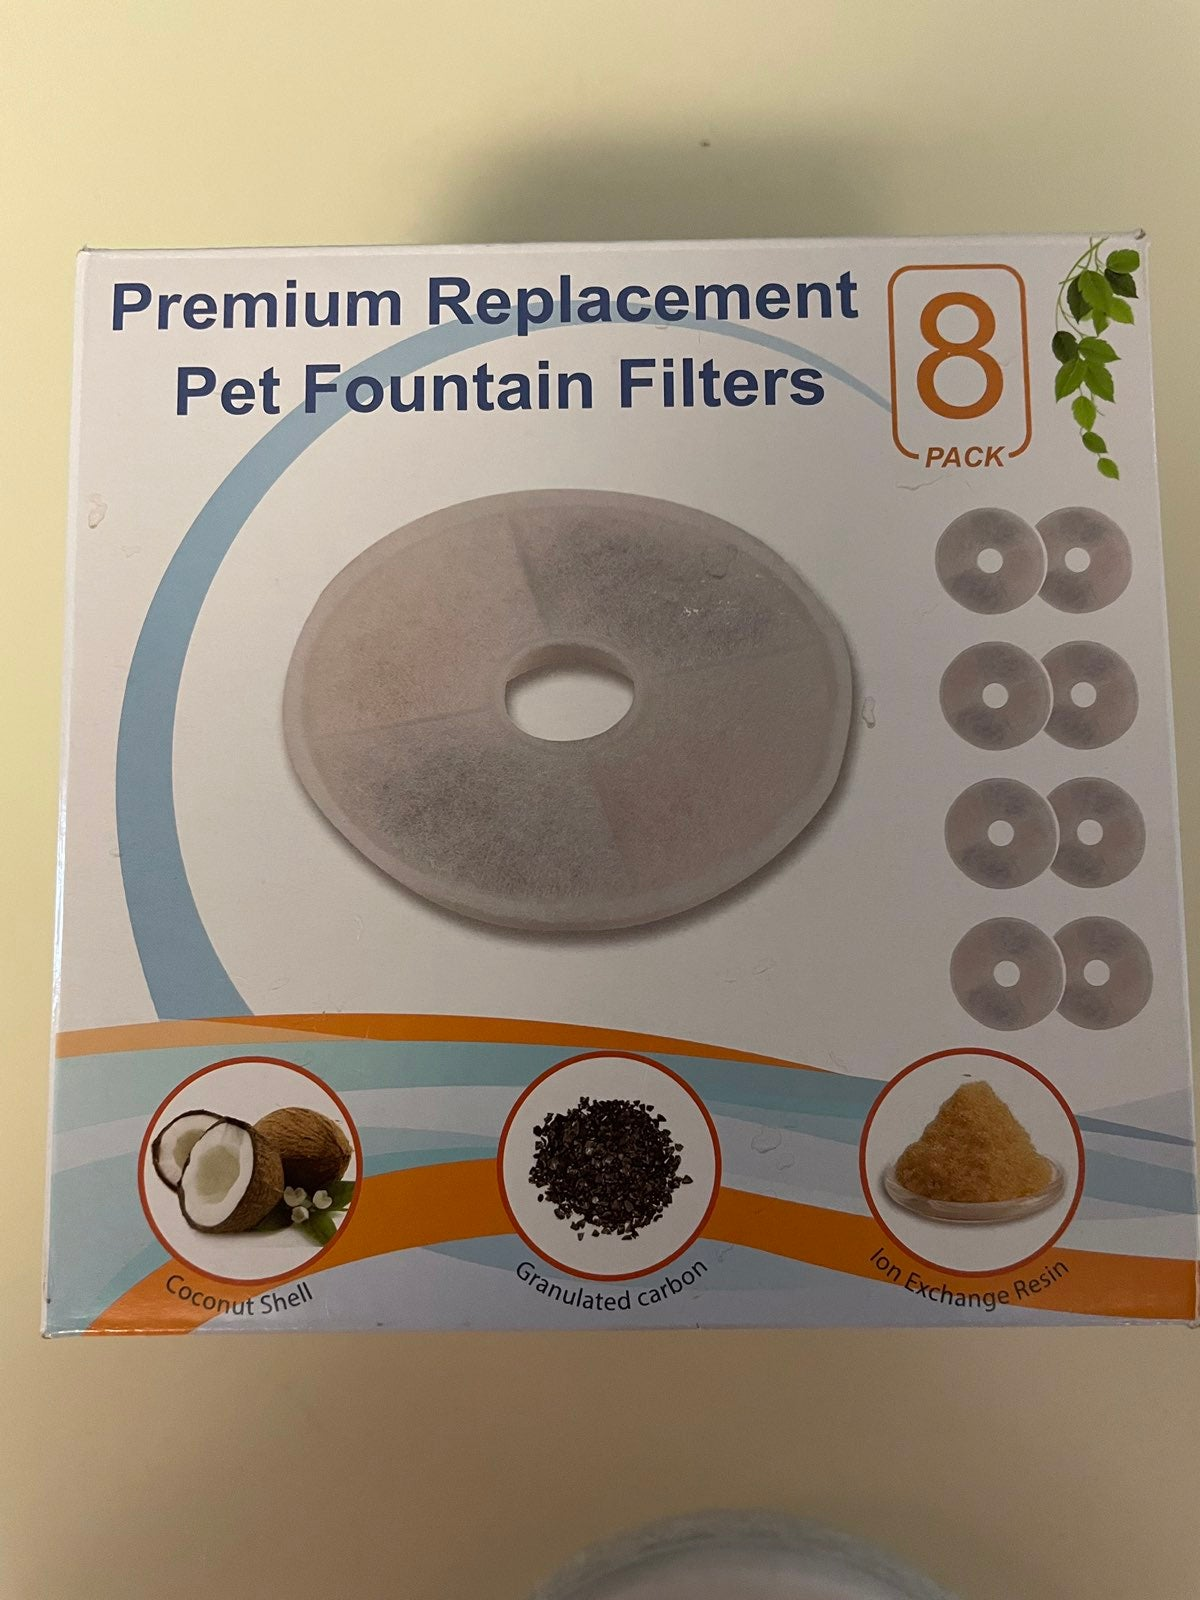 Catit Pet Fountain filters